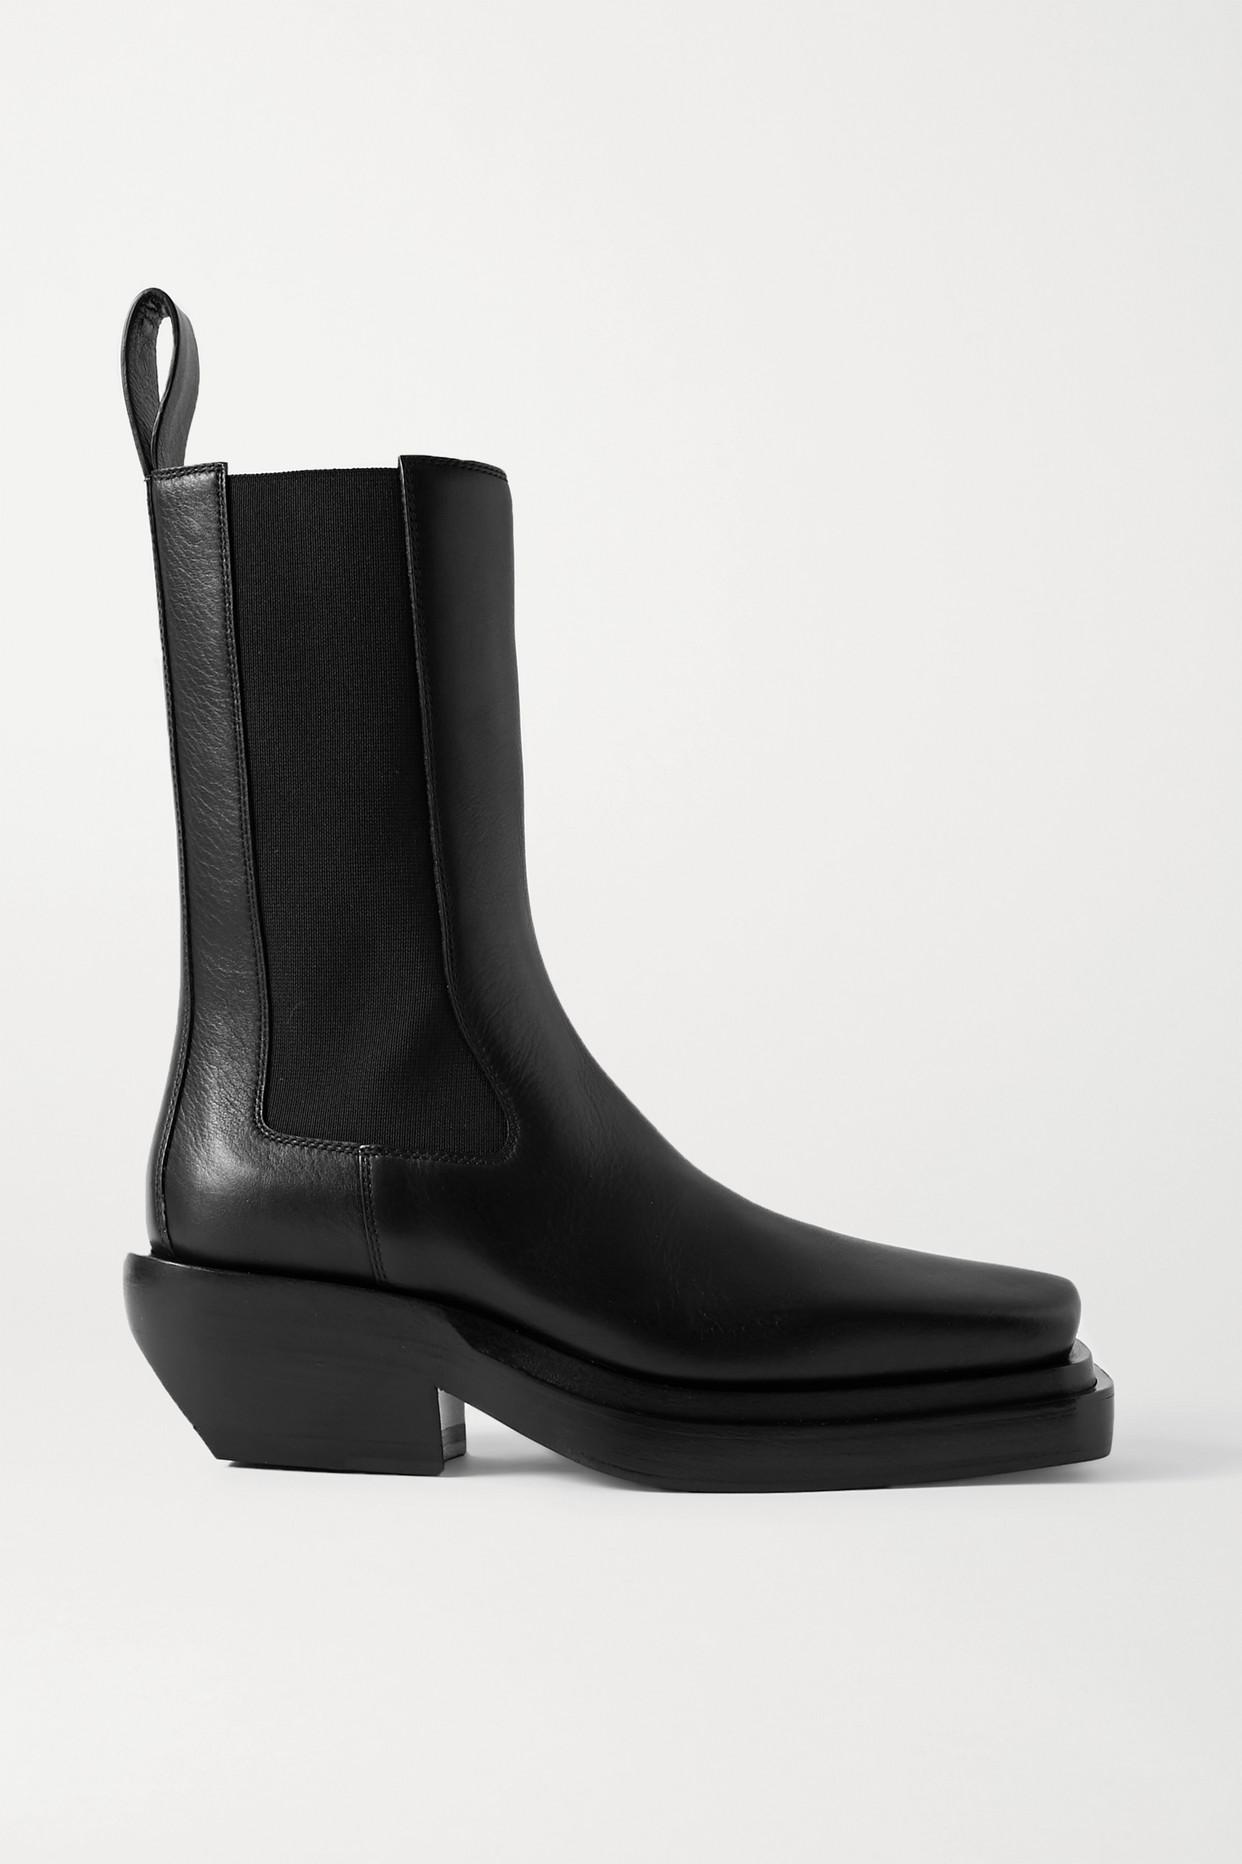 BOTTEGA VENETA - Leather Ankle Boots - Black - IT37